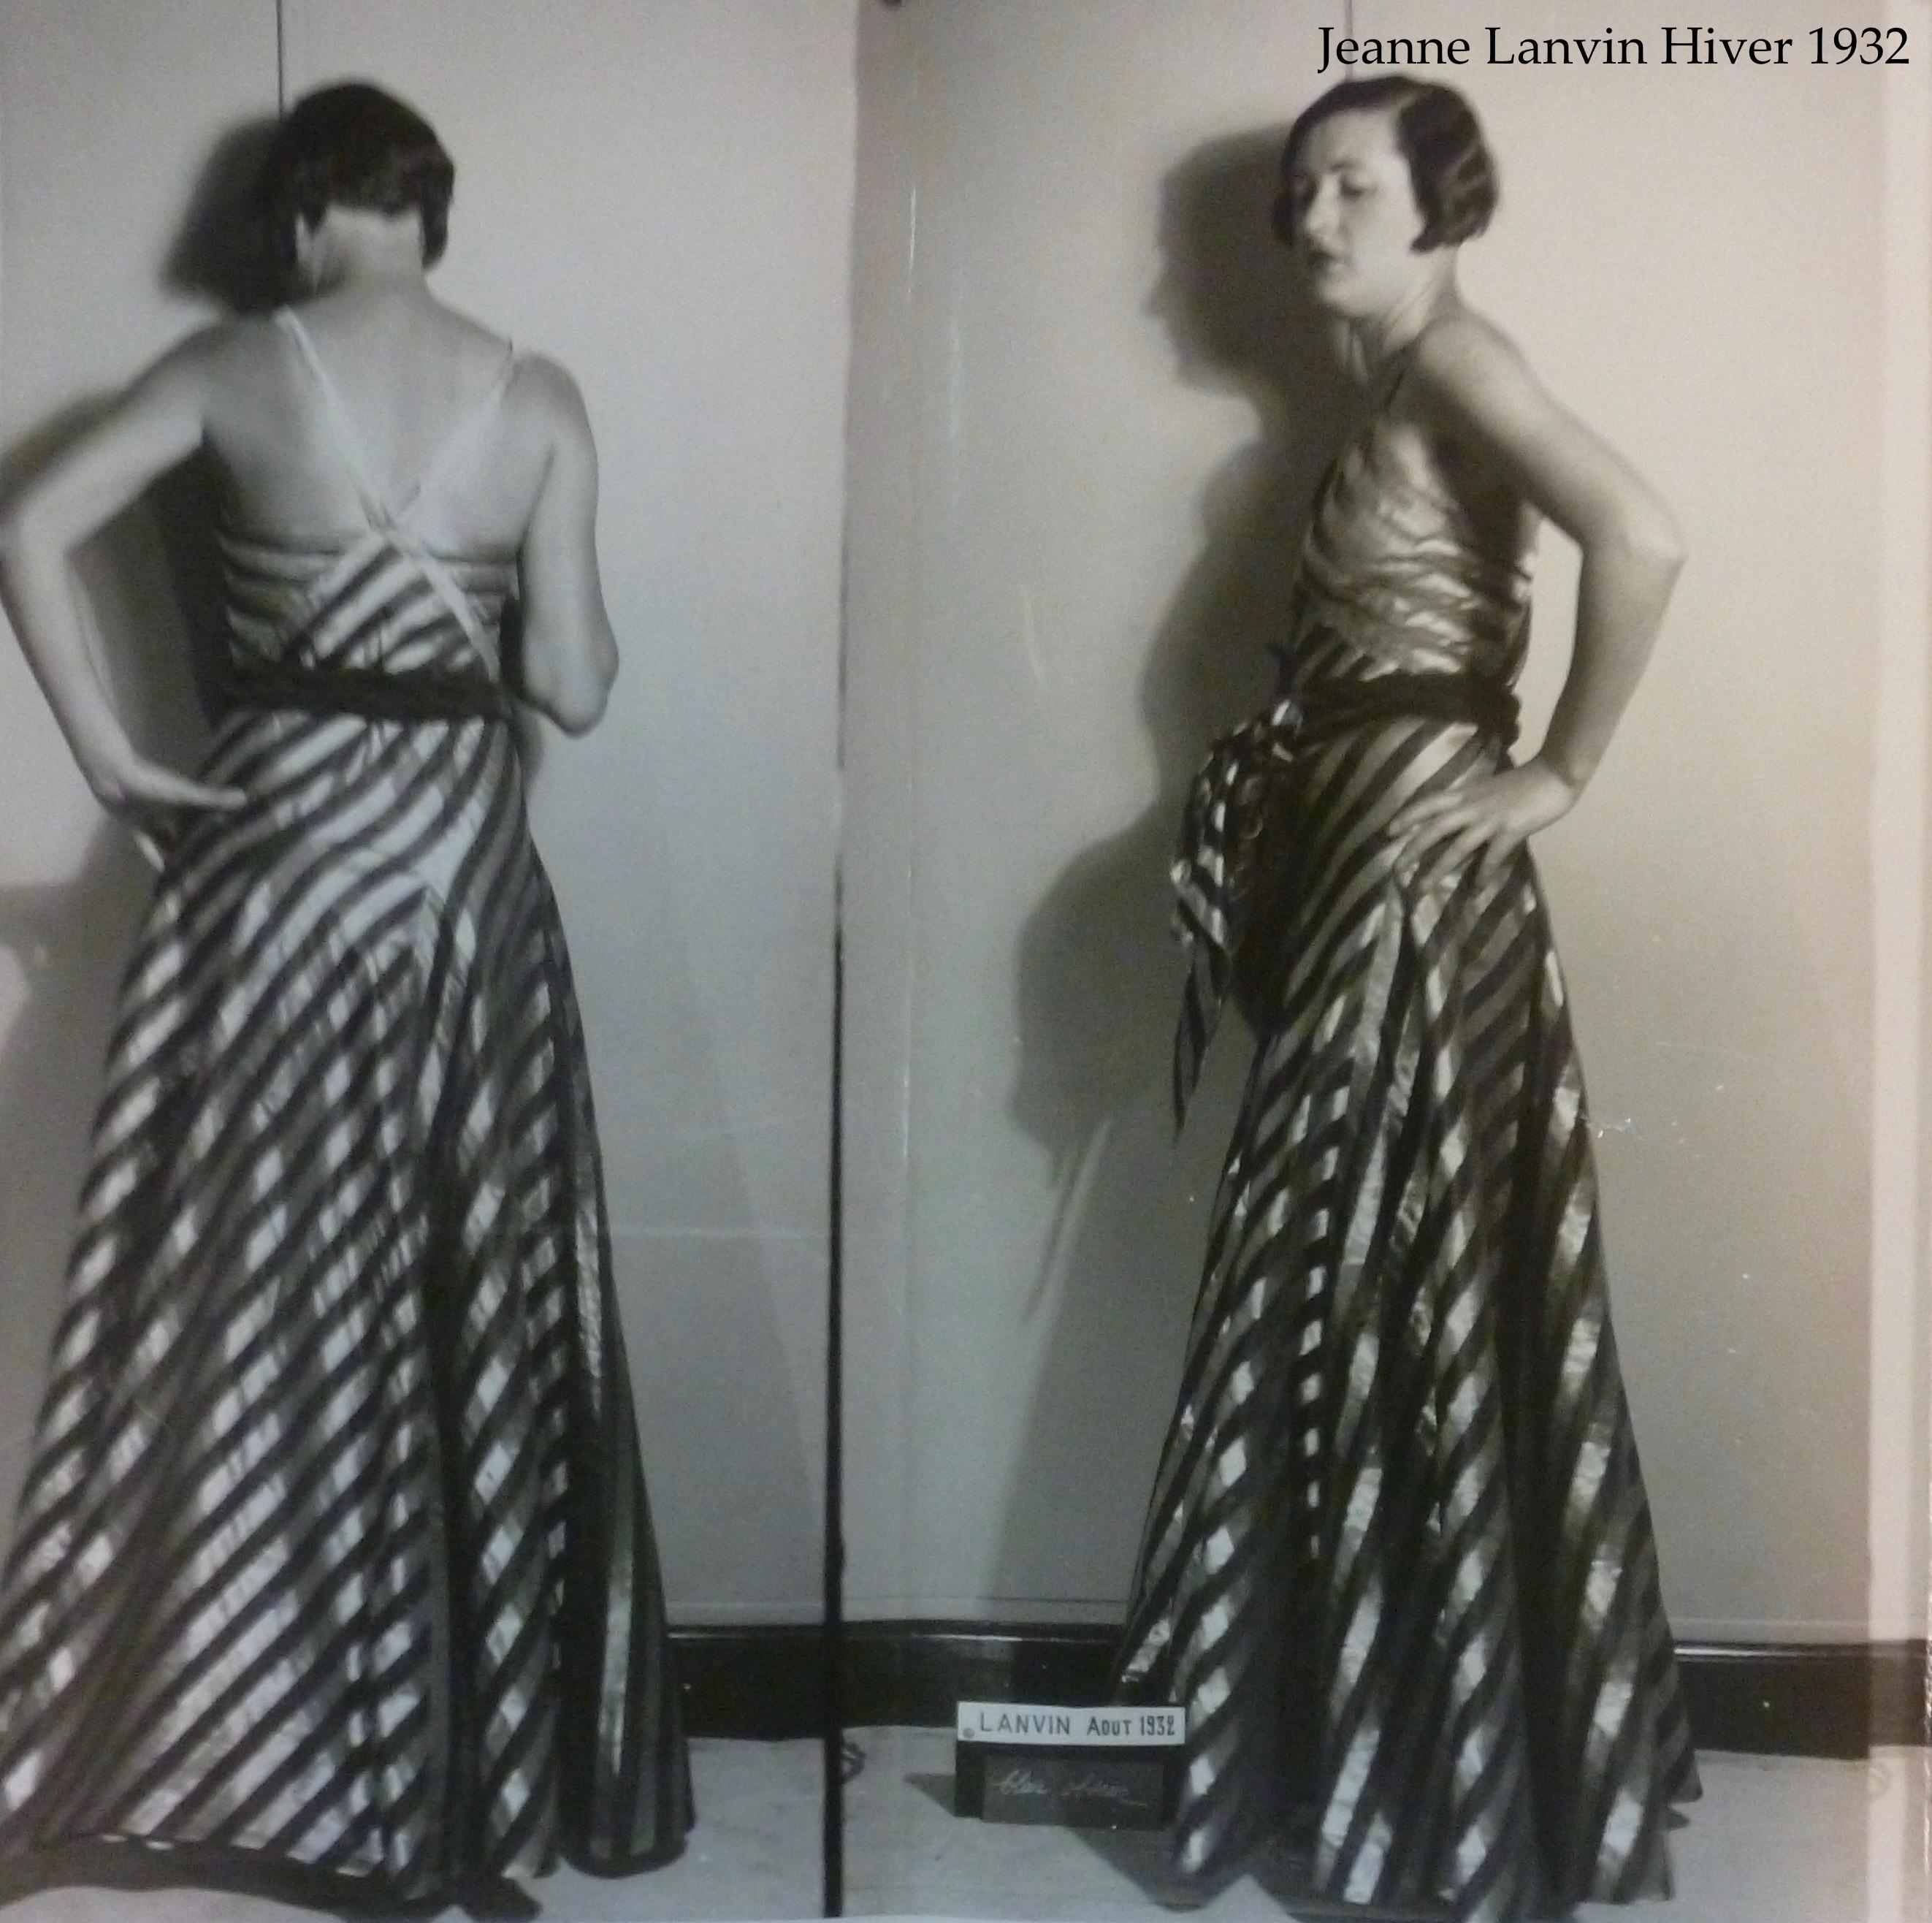 Jeanne Lanvin Hiver 1932